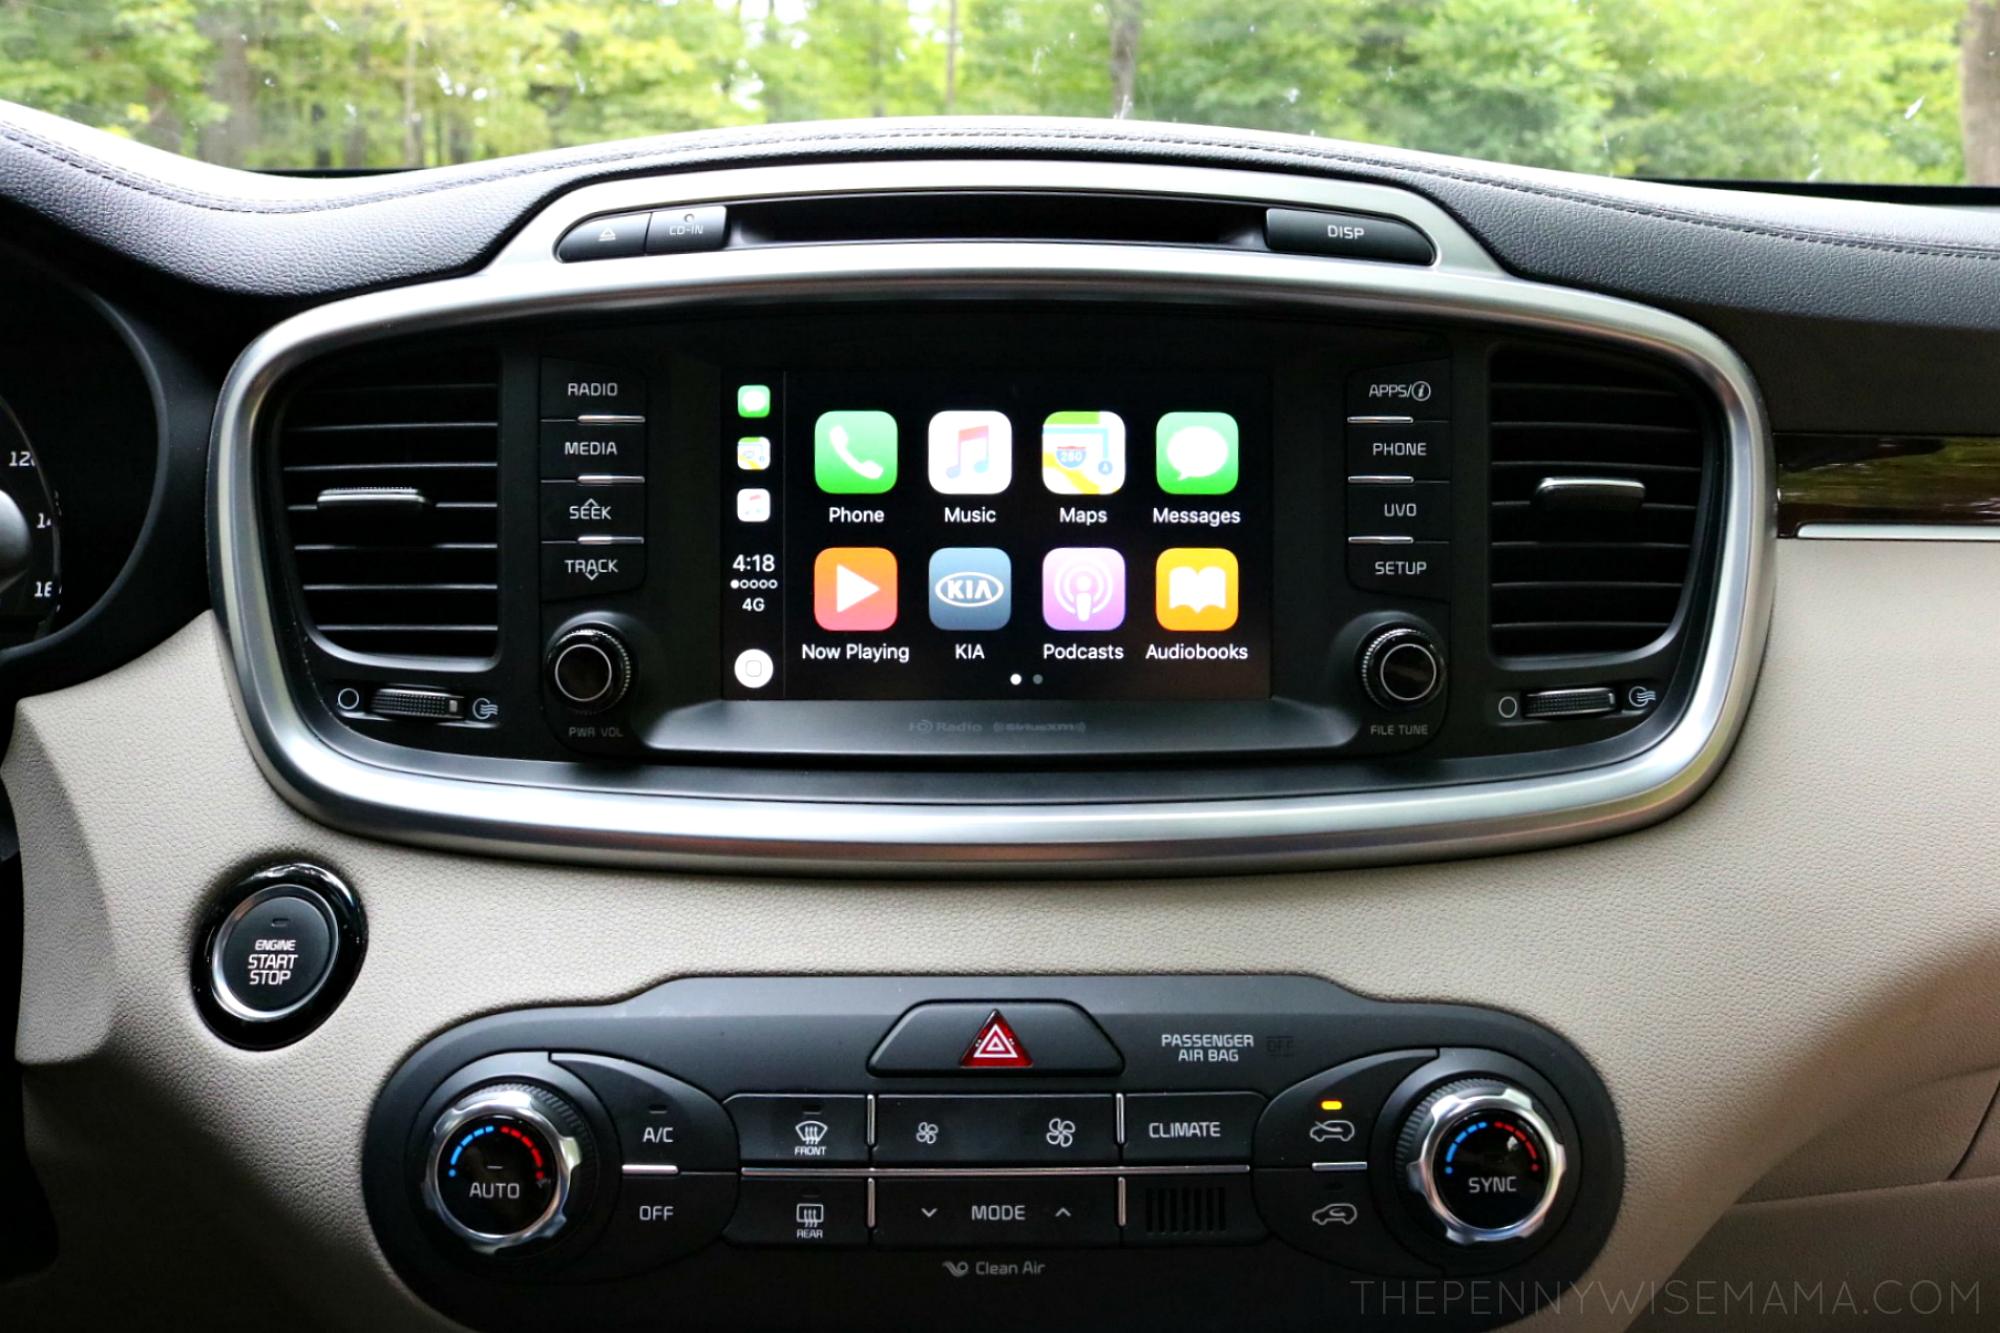 Kia Sorento Car Play Feature